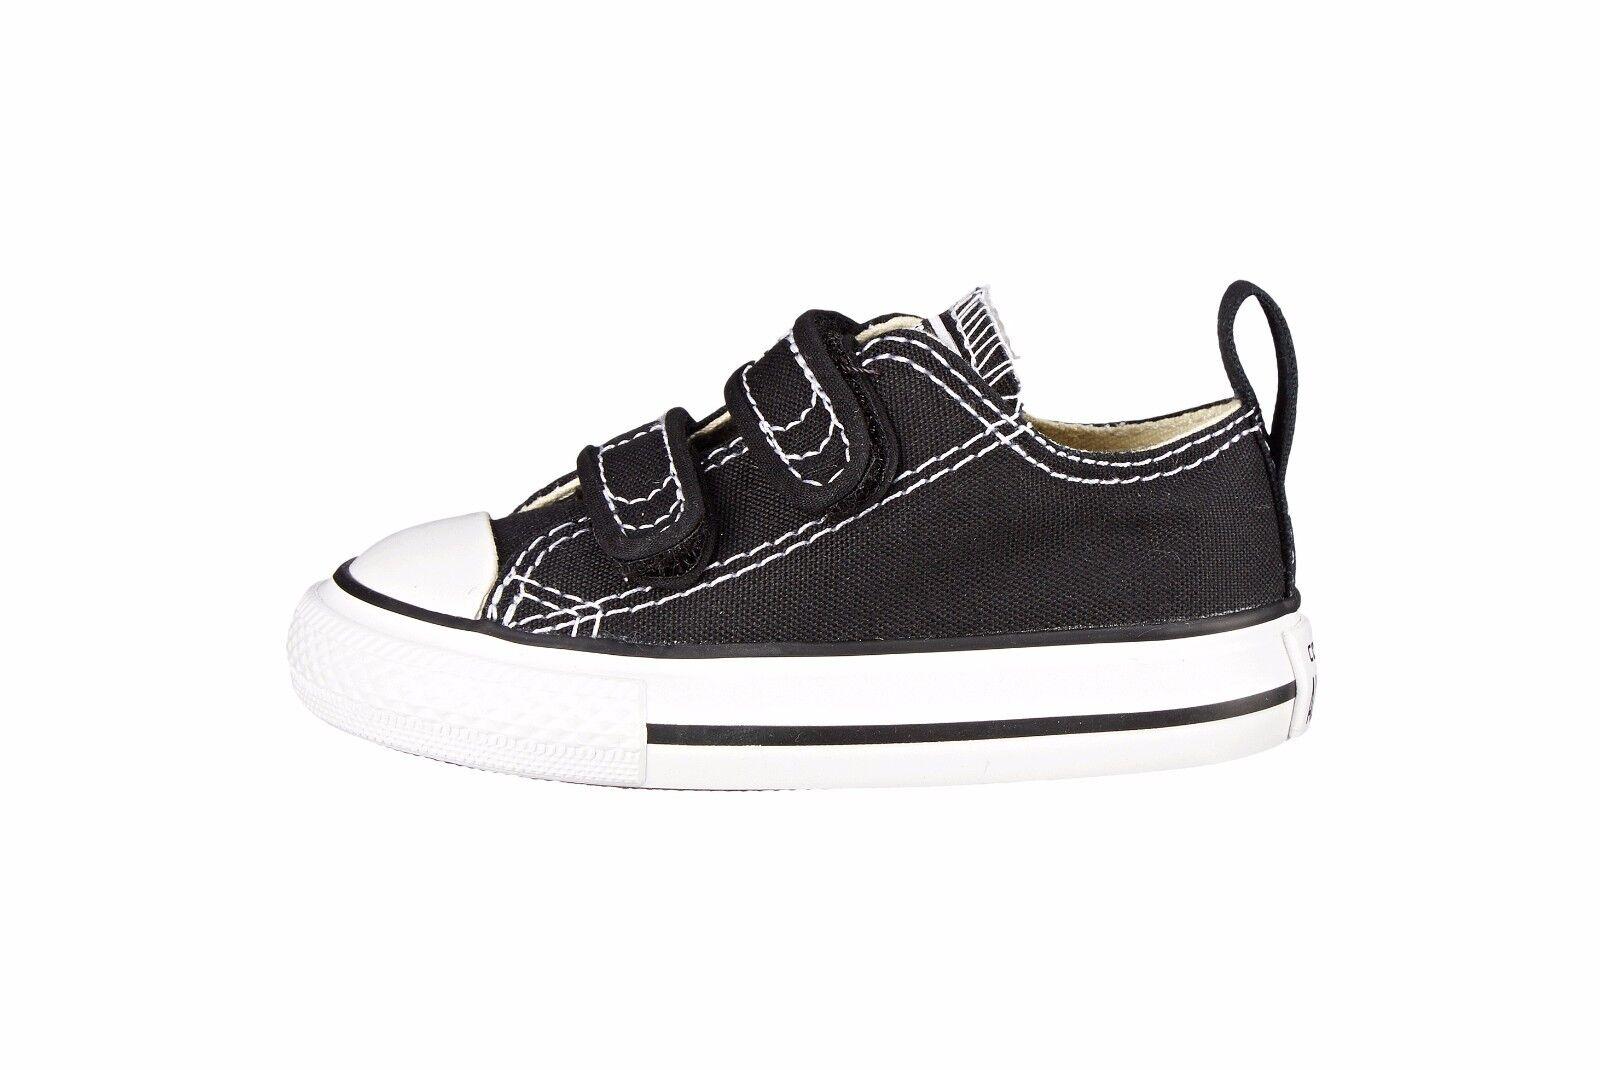 bc6486728d1e71 Converse Toddler Chuck Taylor Velcro 2 Strap Black White Slip on ...